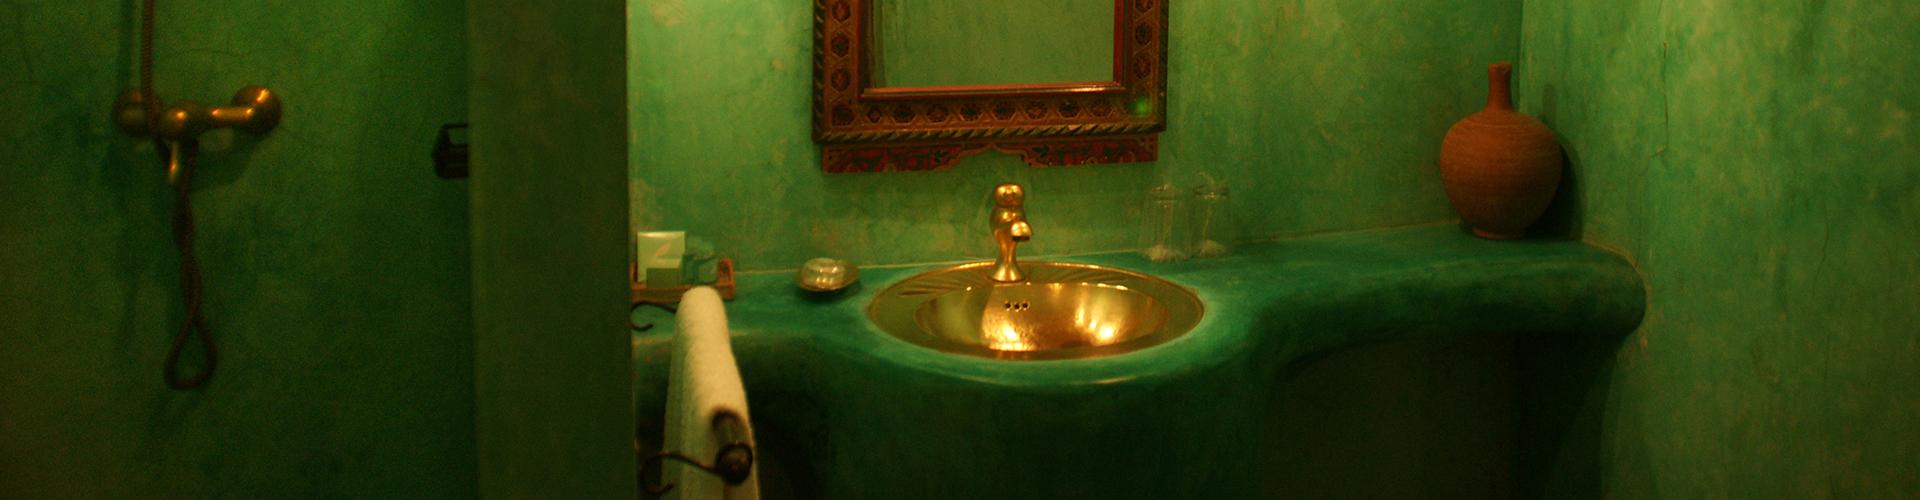 DAR KAMAR. Baño en estuco verde.